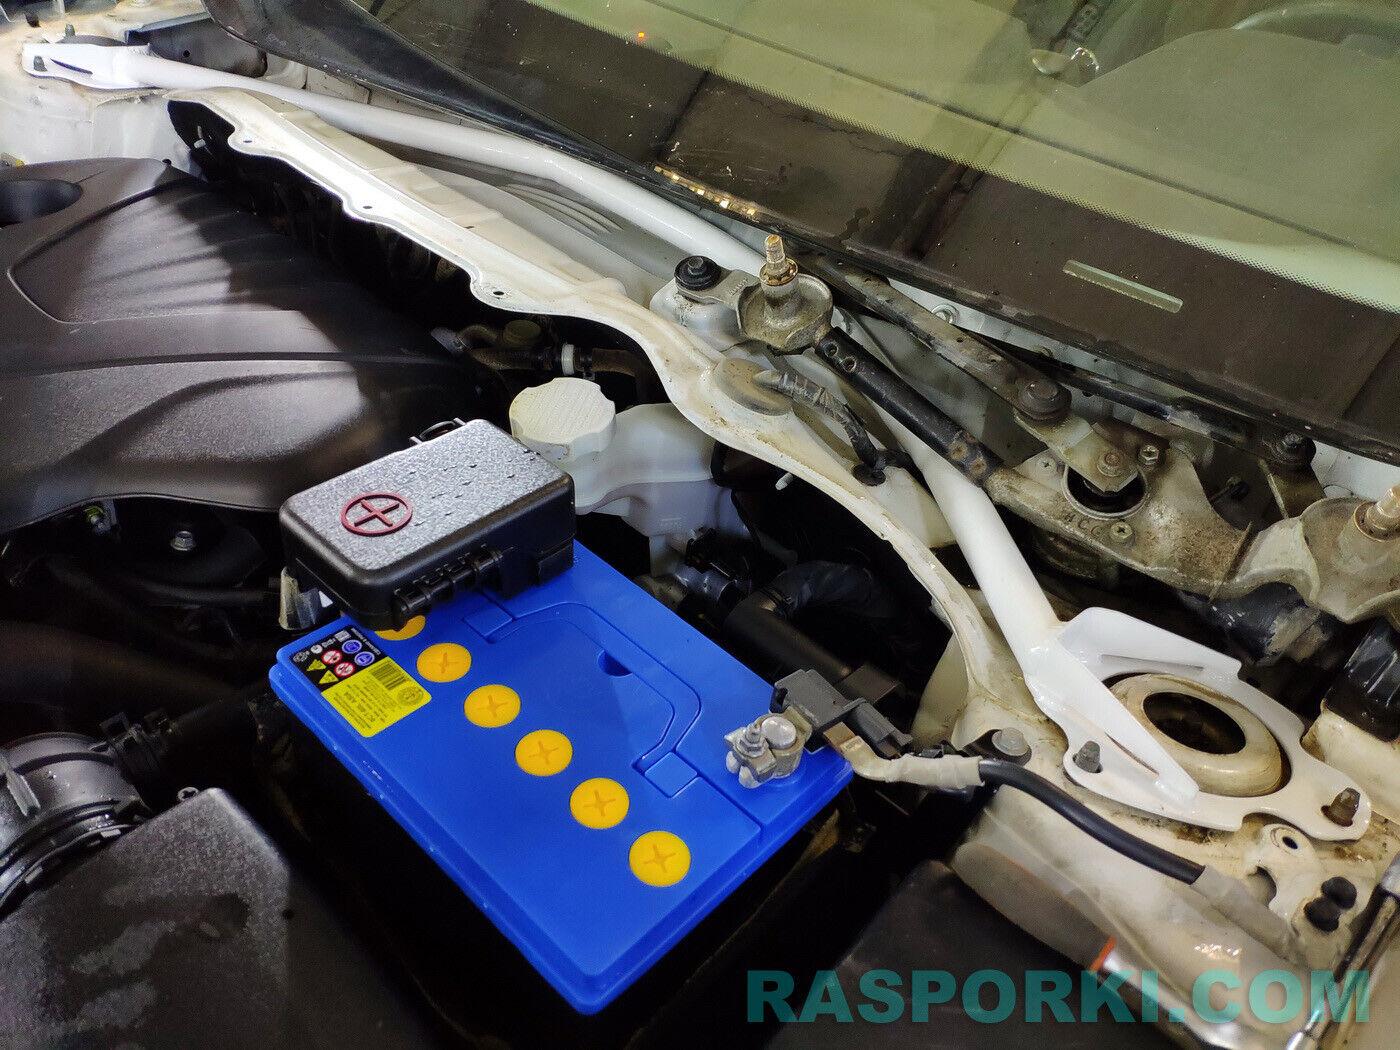 JD Santa Fe DM DENSO HYBRID Scheibenwischer 65//35 Hyundai i30 GD Kia Ceed